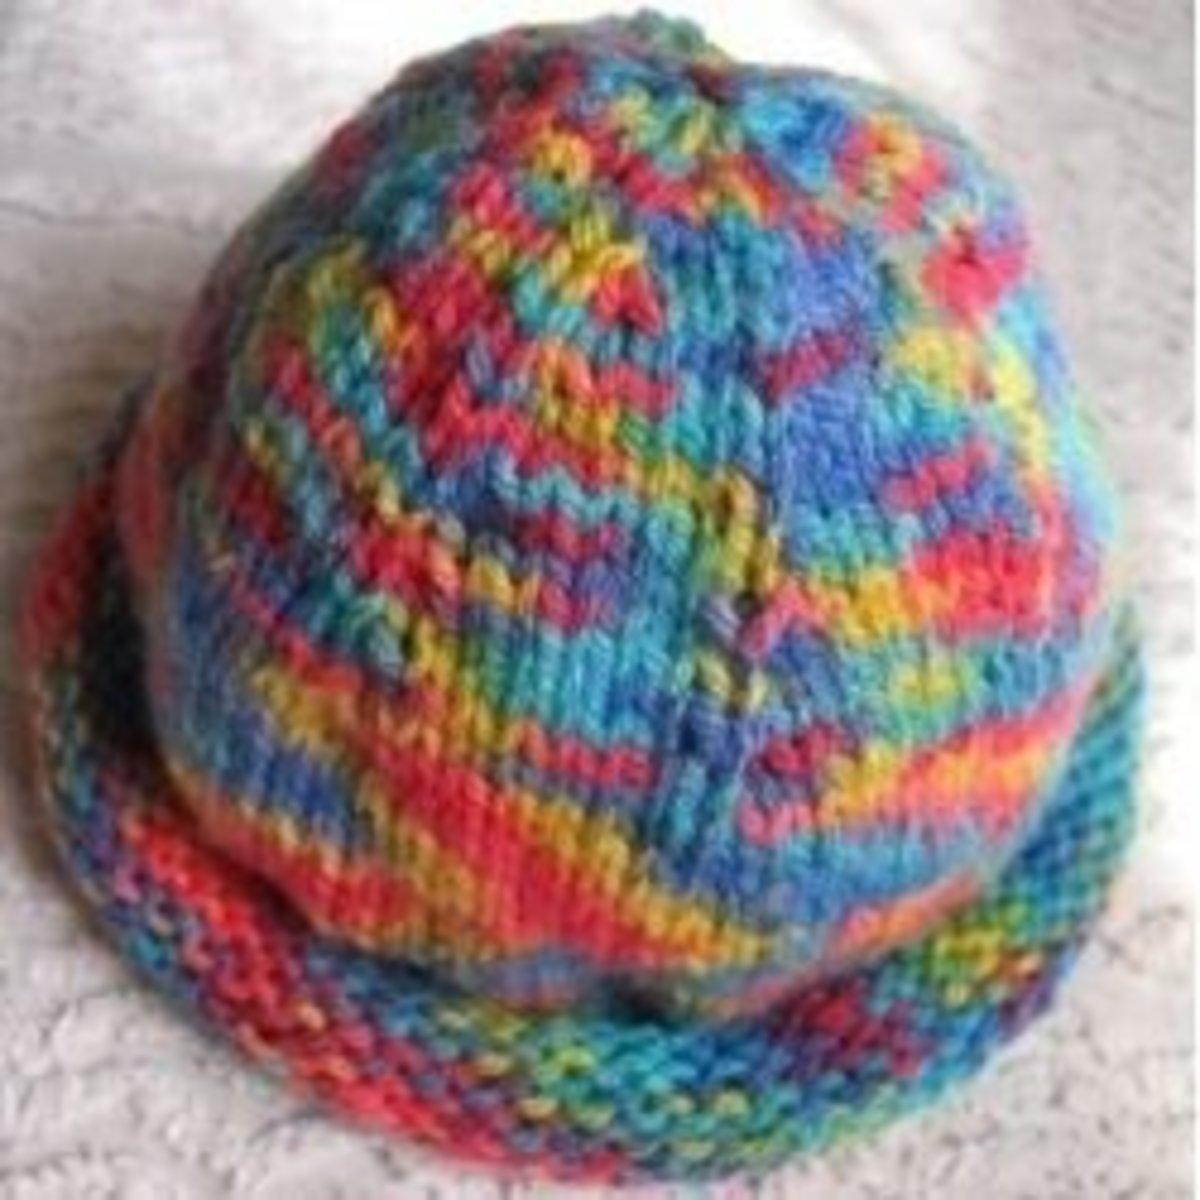 Make Your Own Knitting Pattern Online : Design Your Own Knitting Patterns